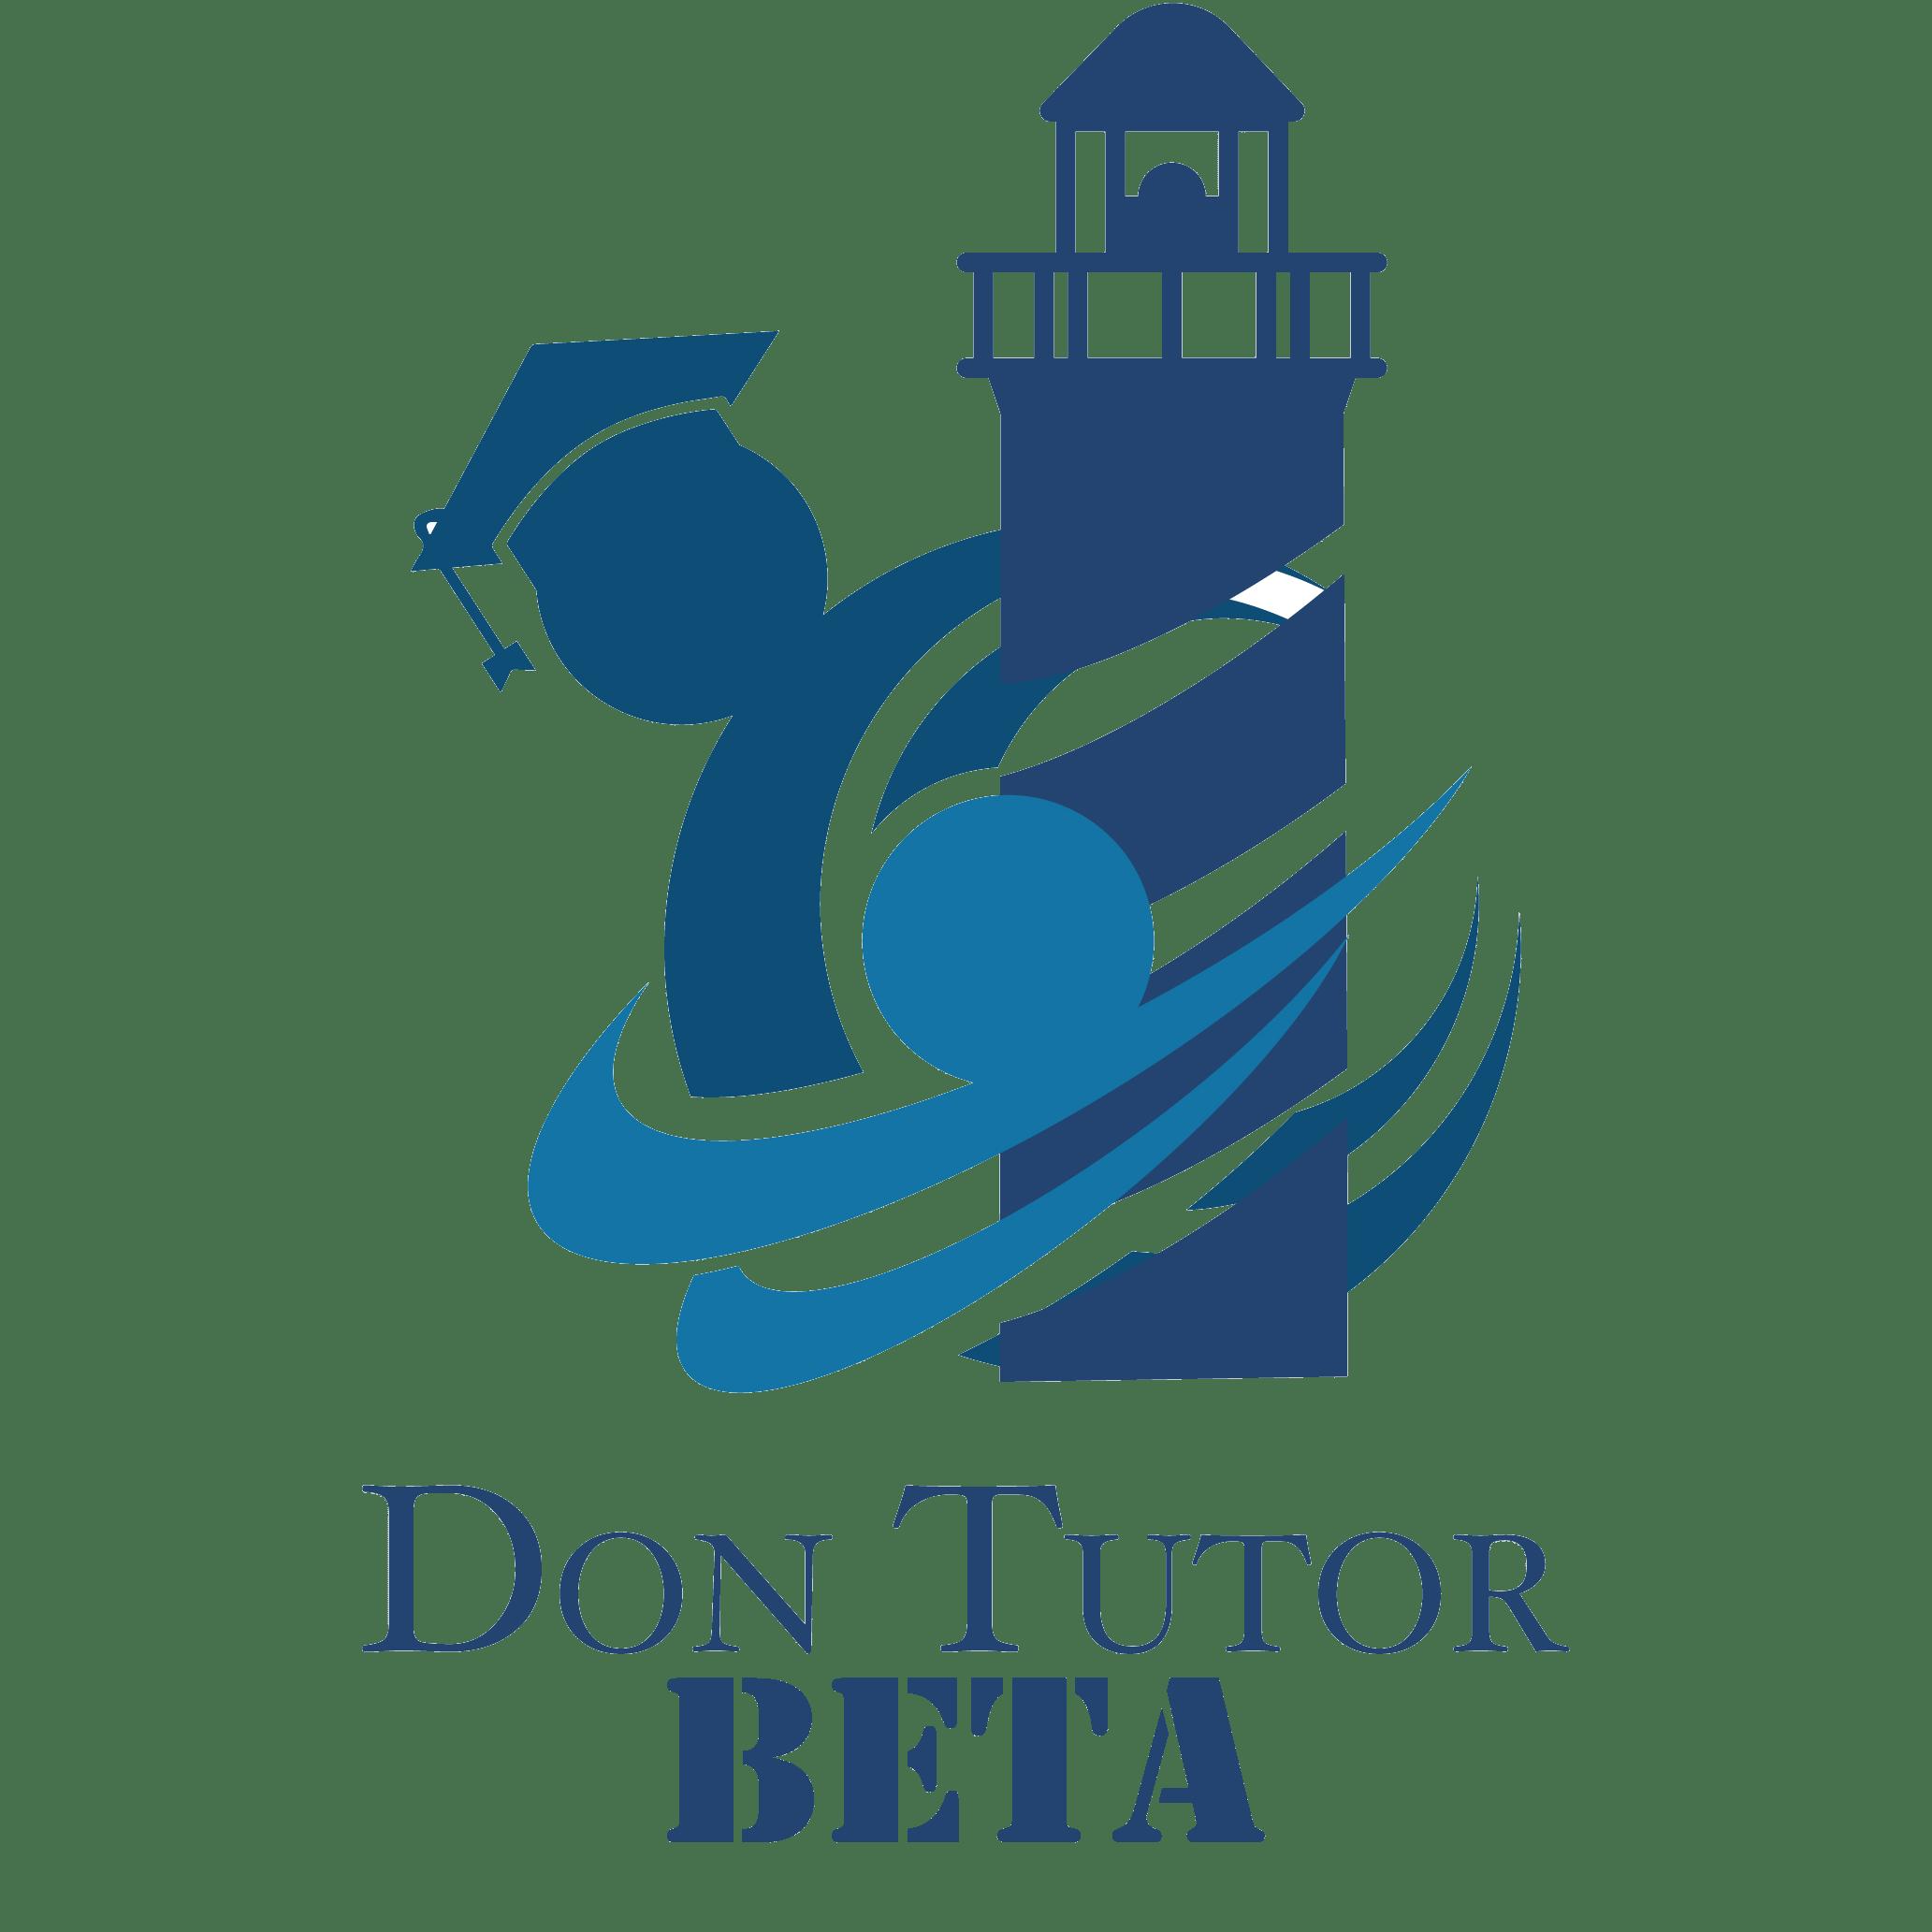 Don tutor